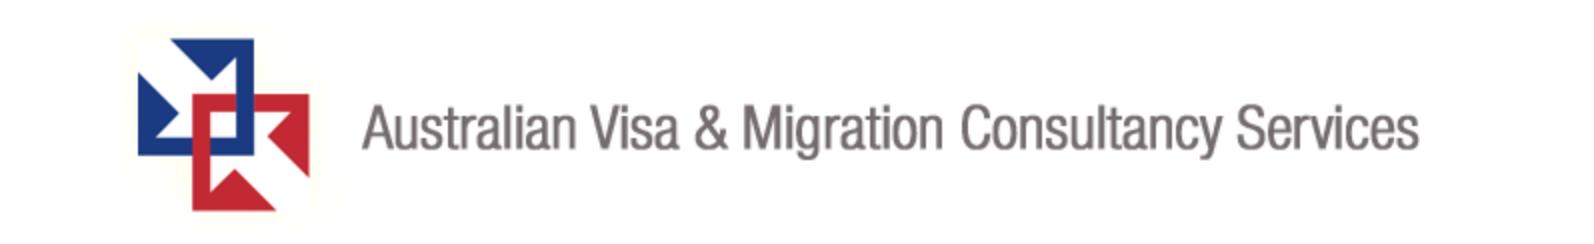 Australia Visa & Migration